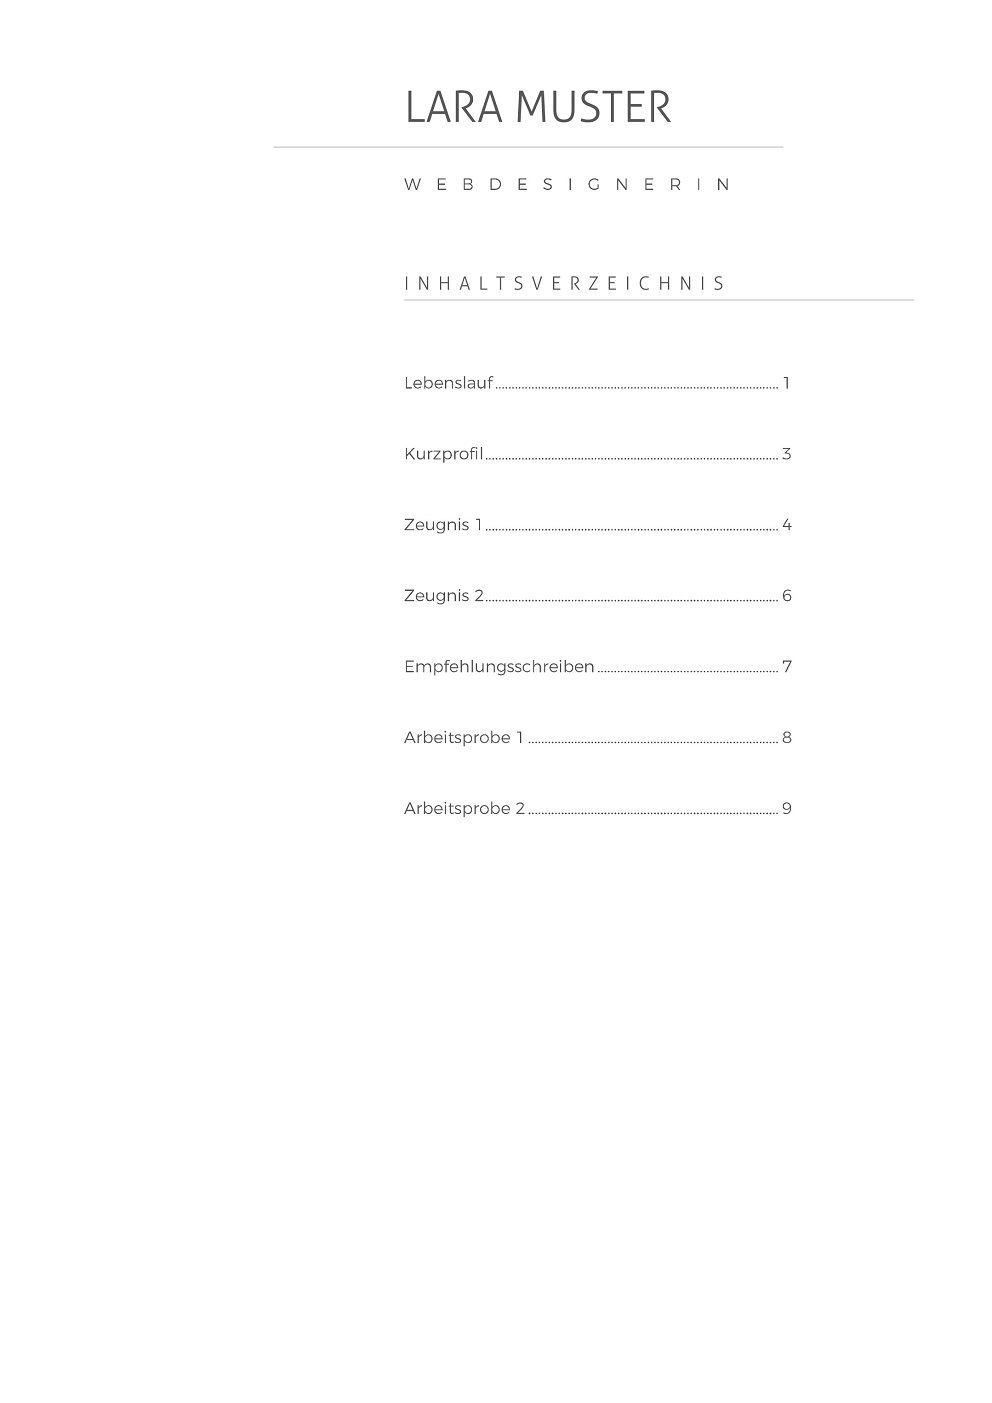 Premium Bewerbungsmuster 10 Lebenslaufdesigns De Empfehlungsschreiben Lebenslauf Bewerbung Muster